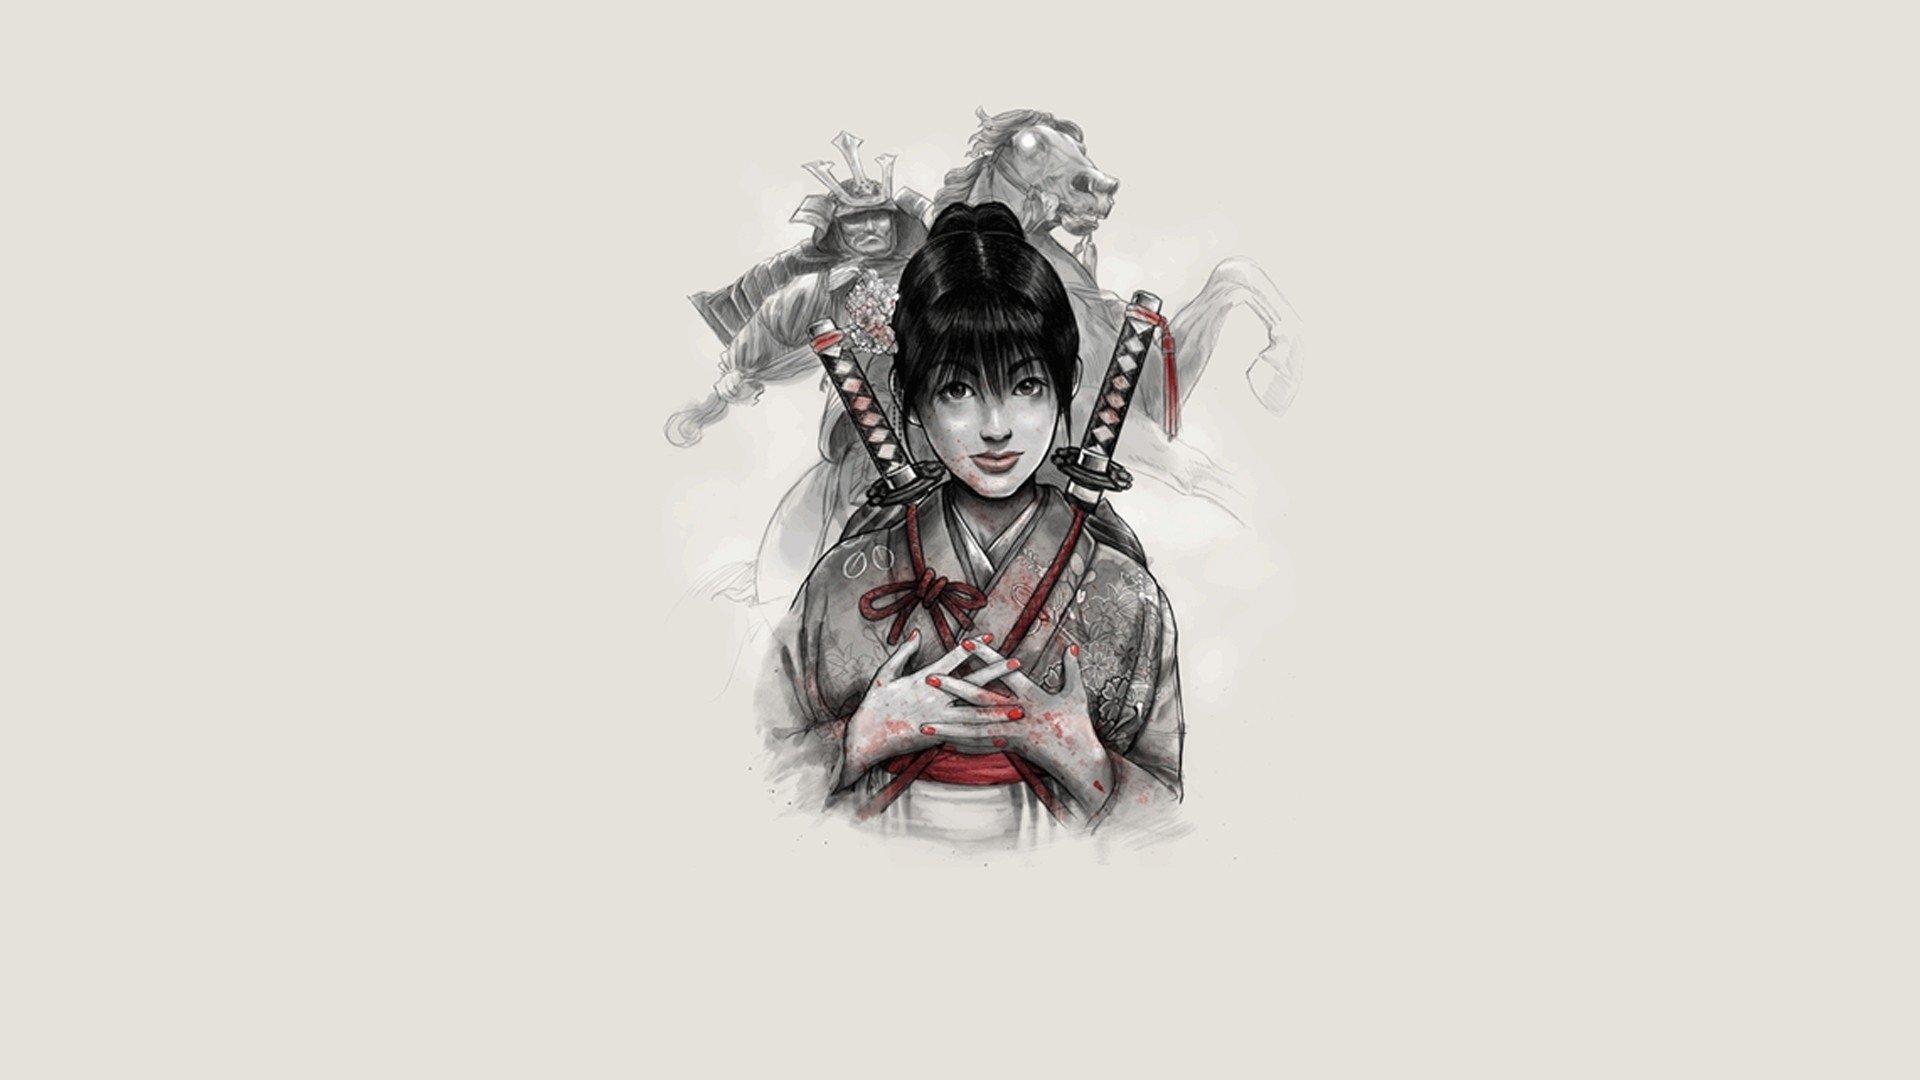 Drawn samurai hd wallpapers Abyss HD Wallpaper 3 HD